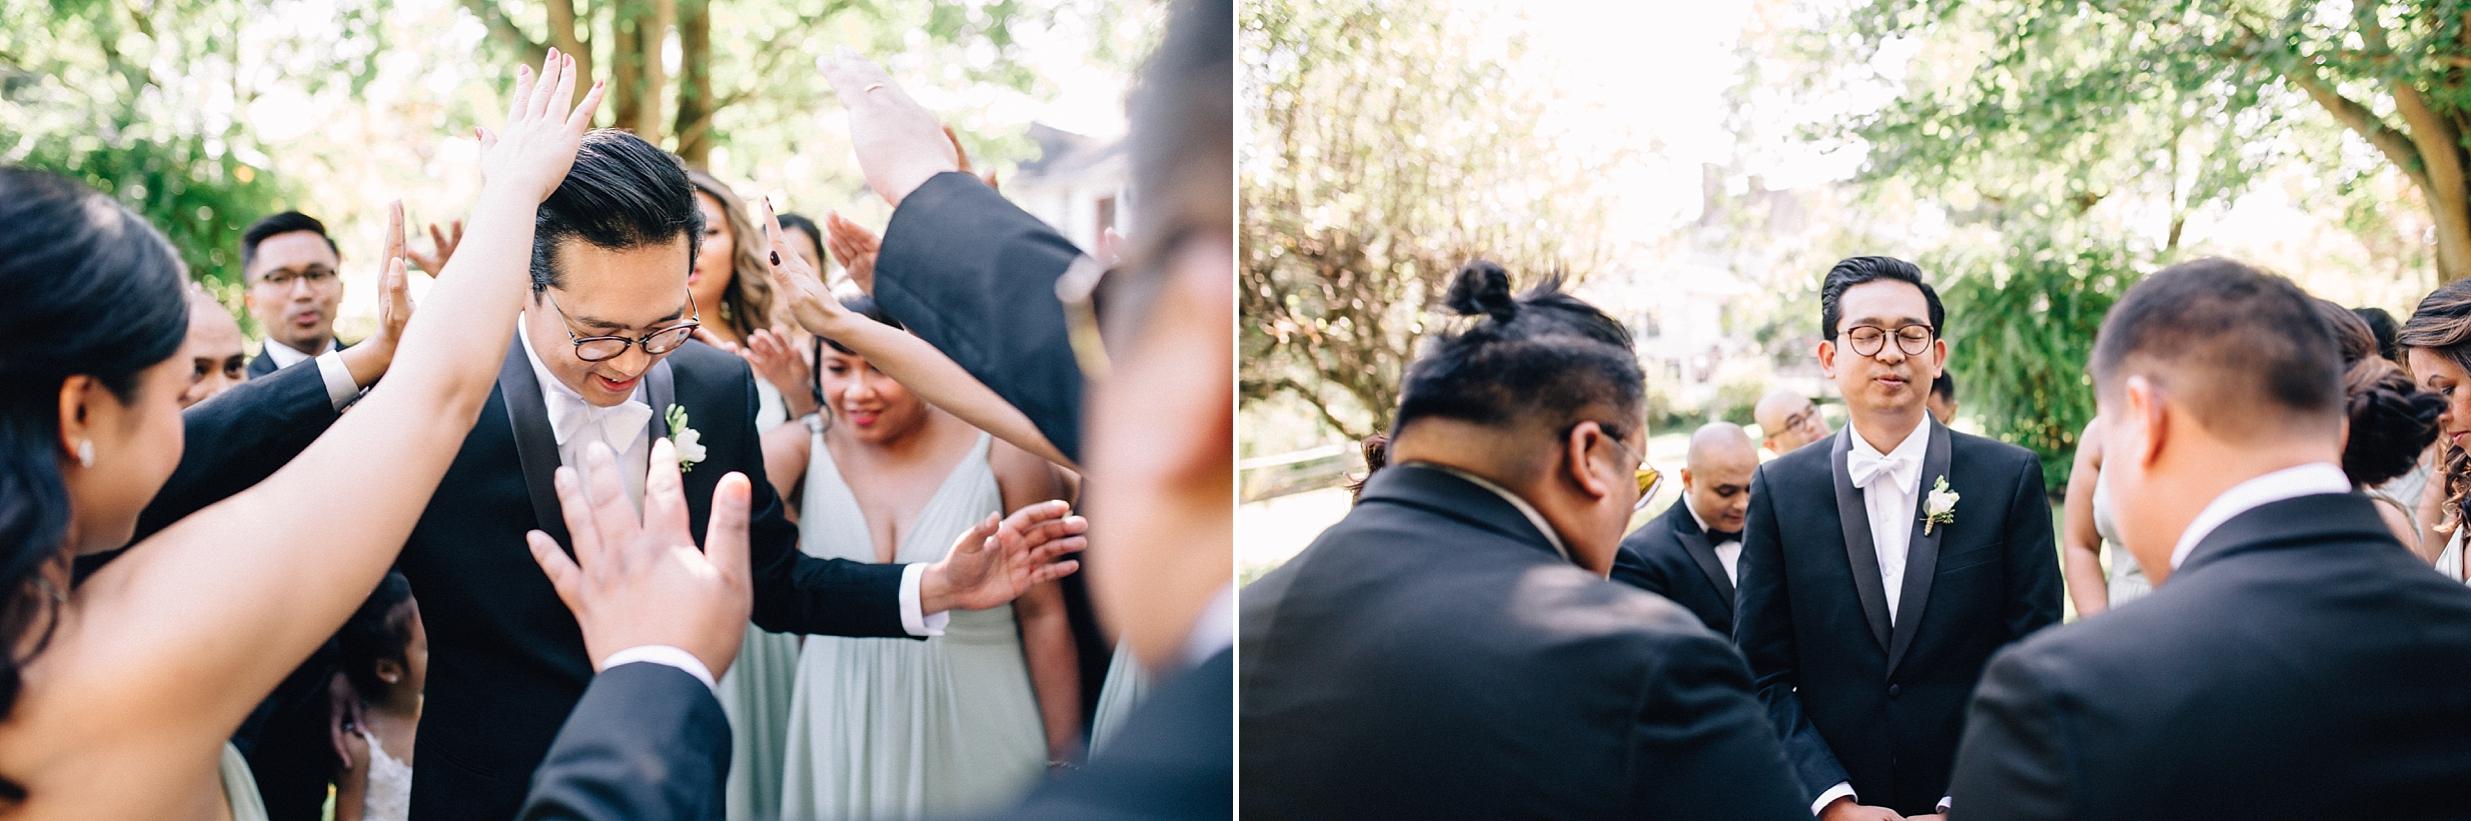 crossed-keys-estate-filipino-wedding-nj_0084.jpg